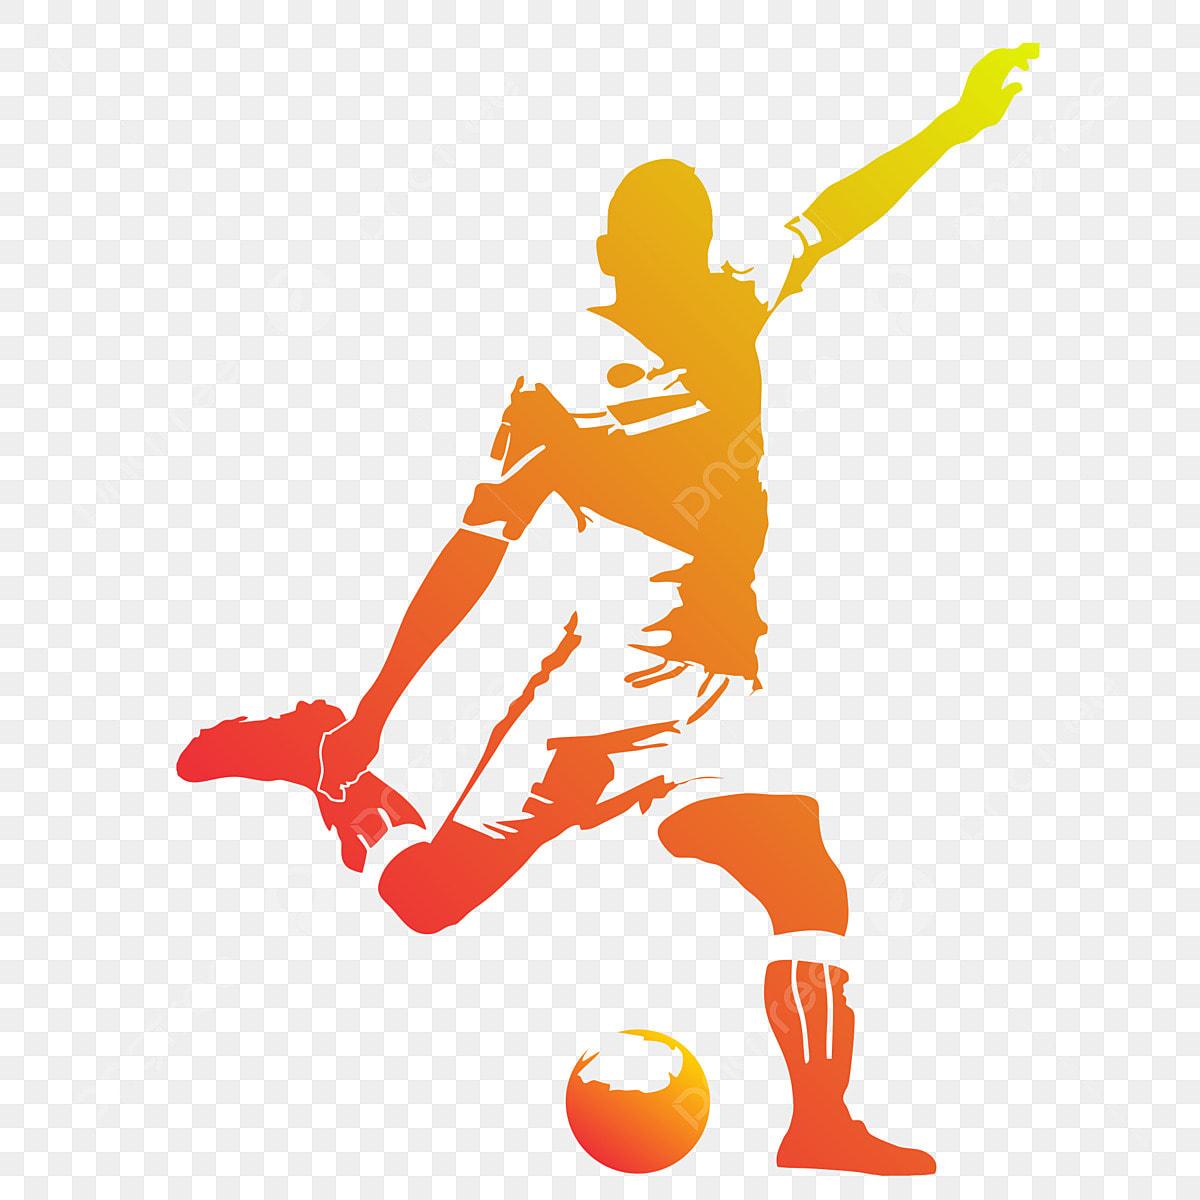 Silhouette Fussballspieler Ball Fubolista Jugando Png Und